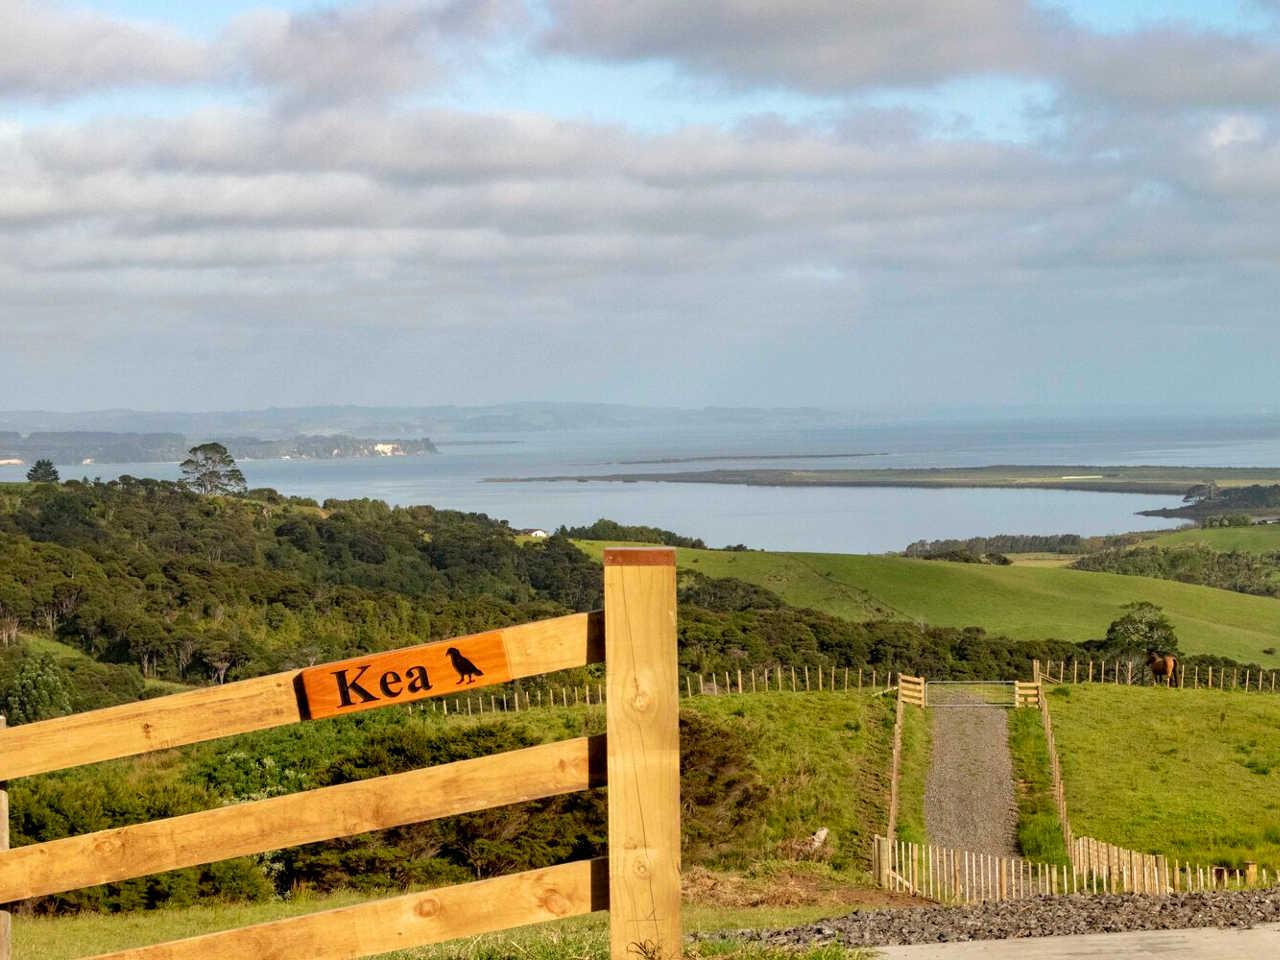 Kaipara Harbour View, Auckland, New Zealand @Kaiparaharbourview